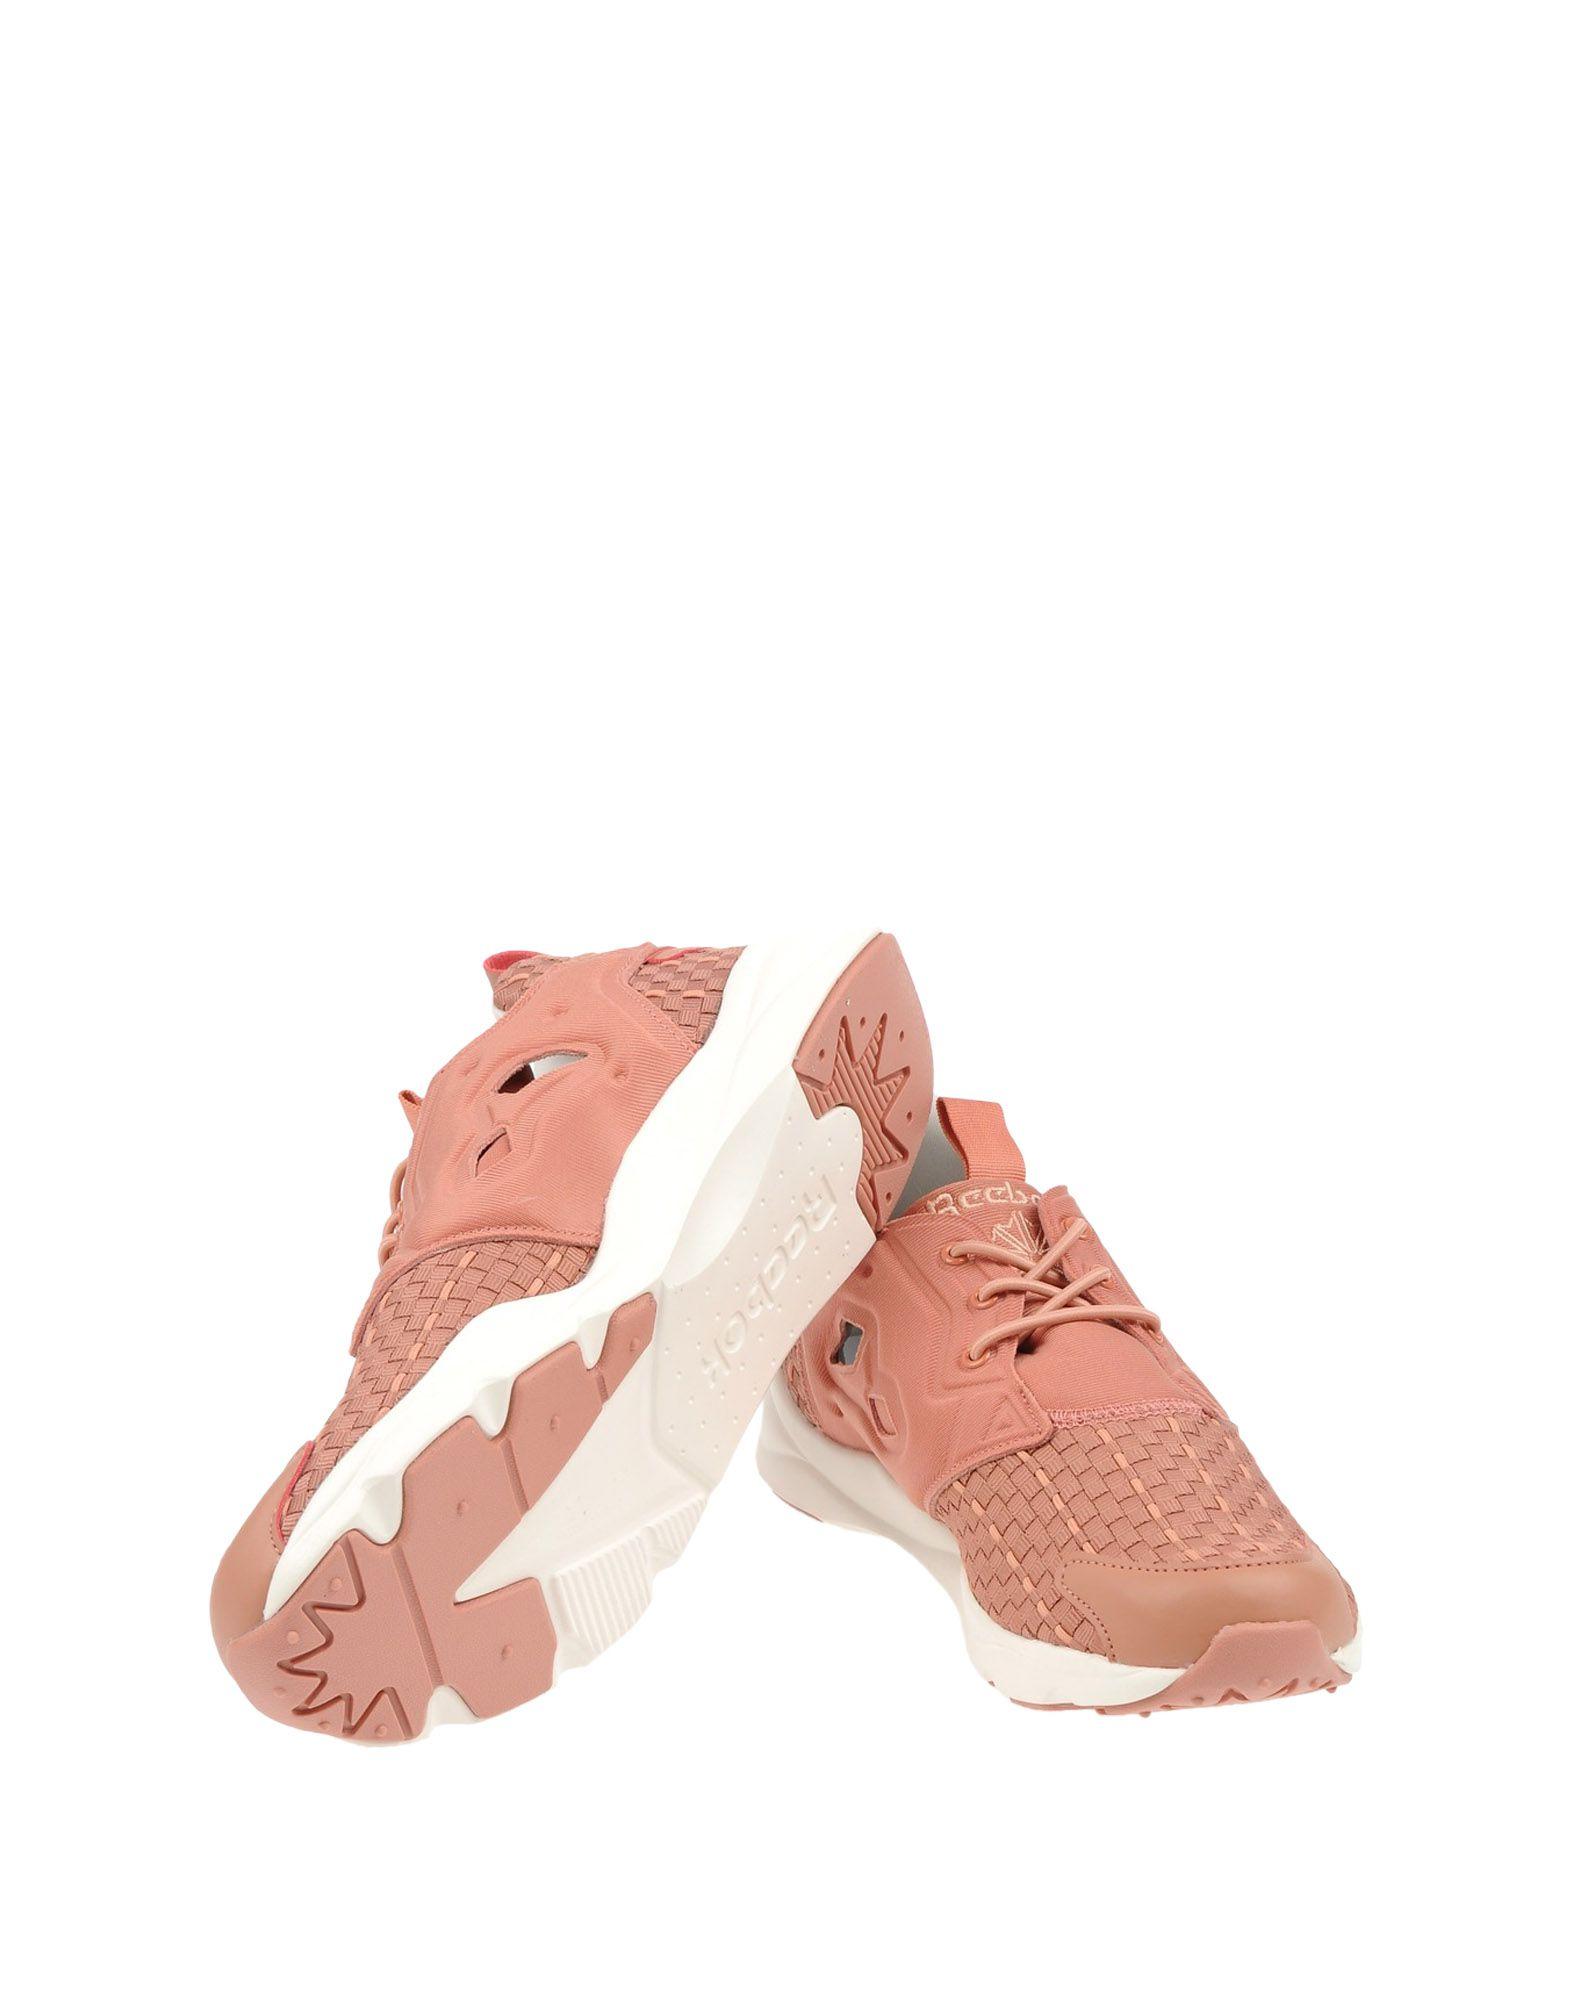 Sneakers Reebok Furylite New Woven - Femme - Sneakers Reebok sur